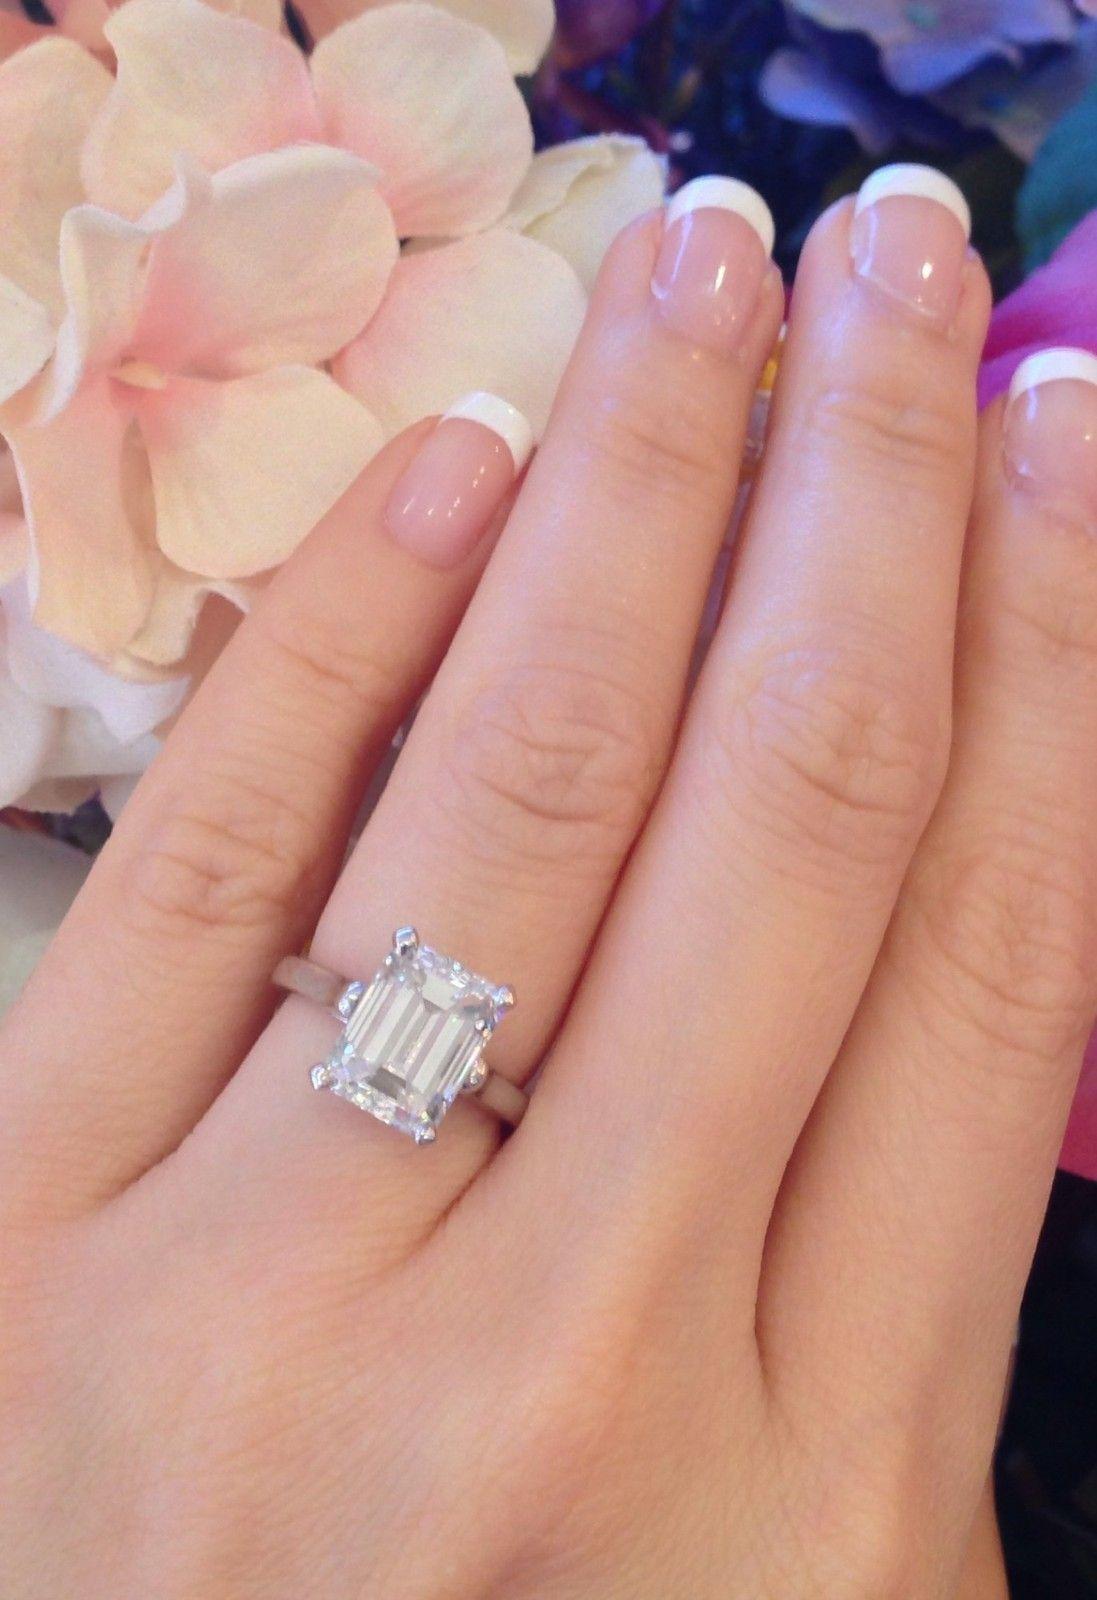 · tiffany & co 3.86 ct gia vs2-g emerald cut platinum diamond